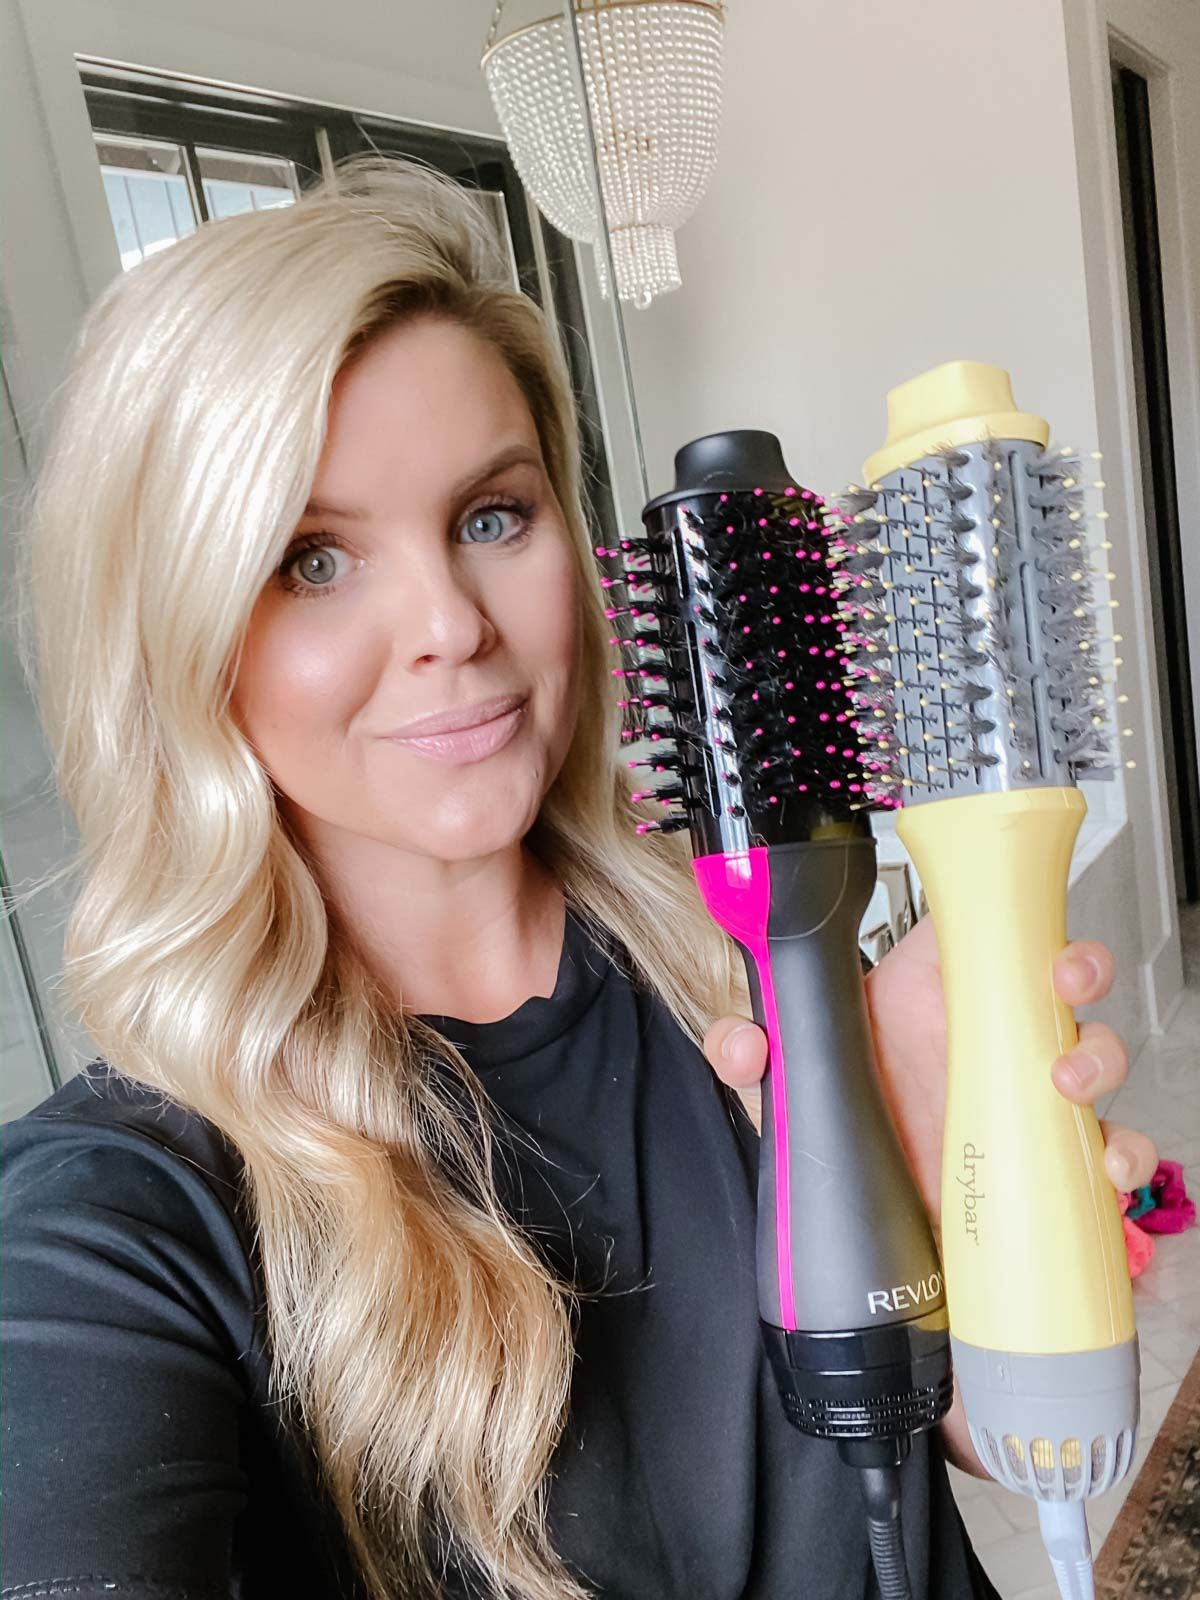 Review Drybar Vs Revlon Dry Long Hair Air Dry Hair Blow Dry Hair